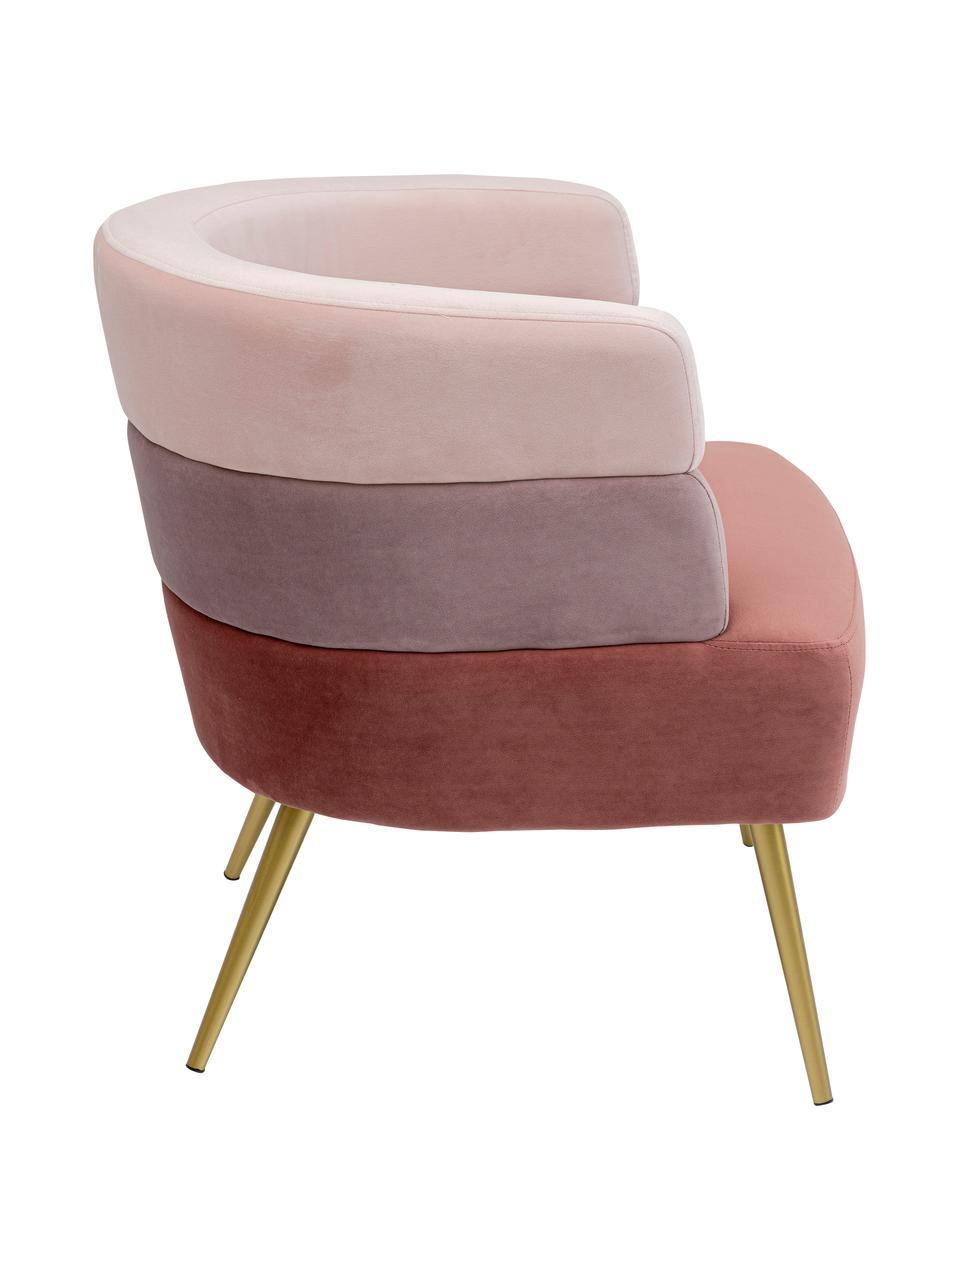 Fluwelen fauteuil Sandwich in retro-design, Bekleding: polyester fluweel, Poten: gecoat metaal, Fluweel roze, B 65 x D 64 cm